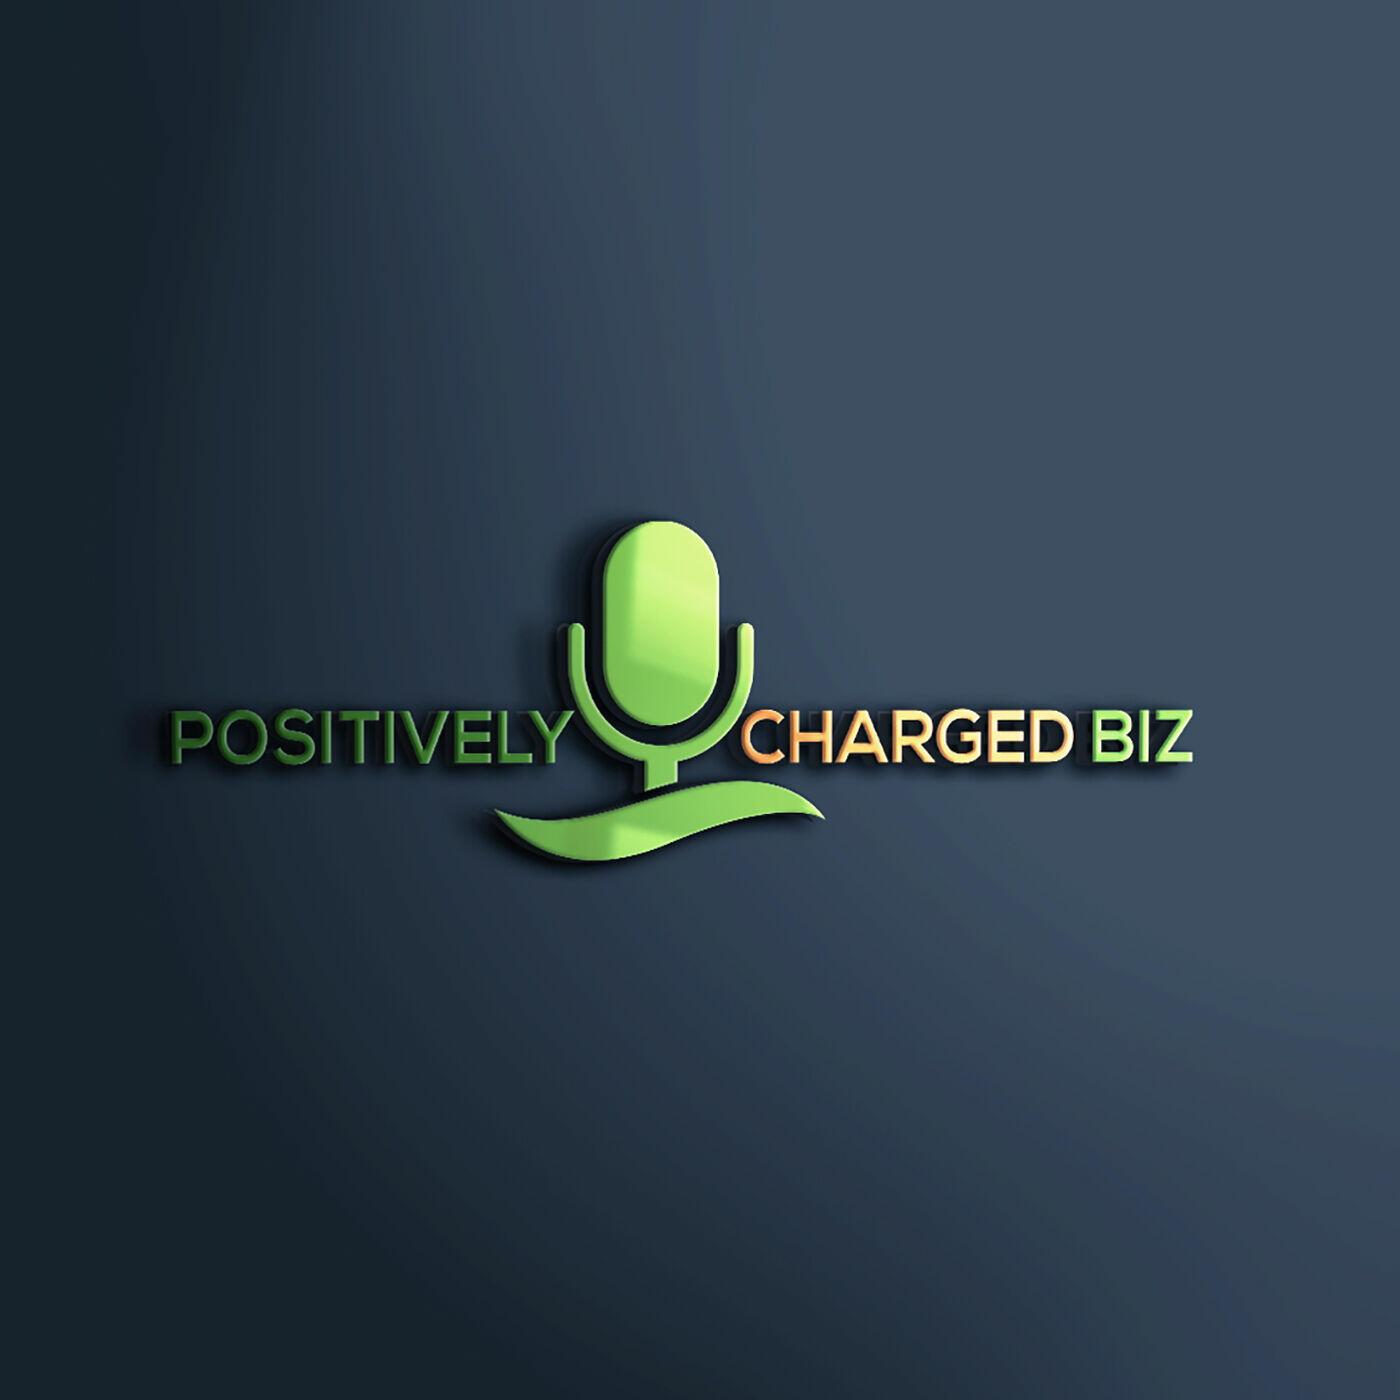 Positively Charged Biz